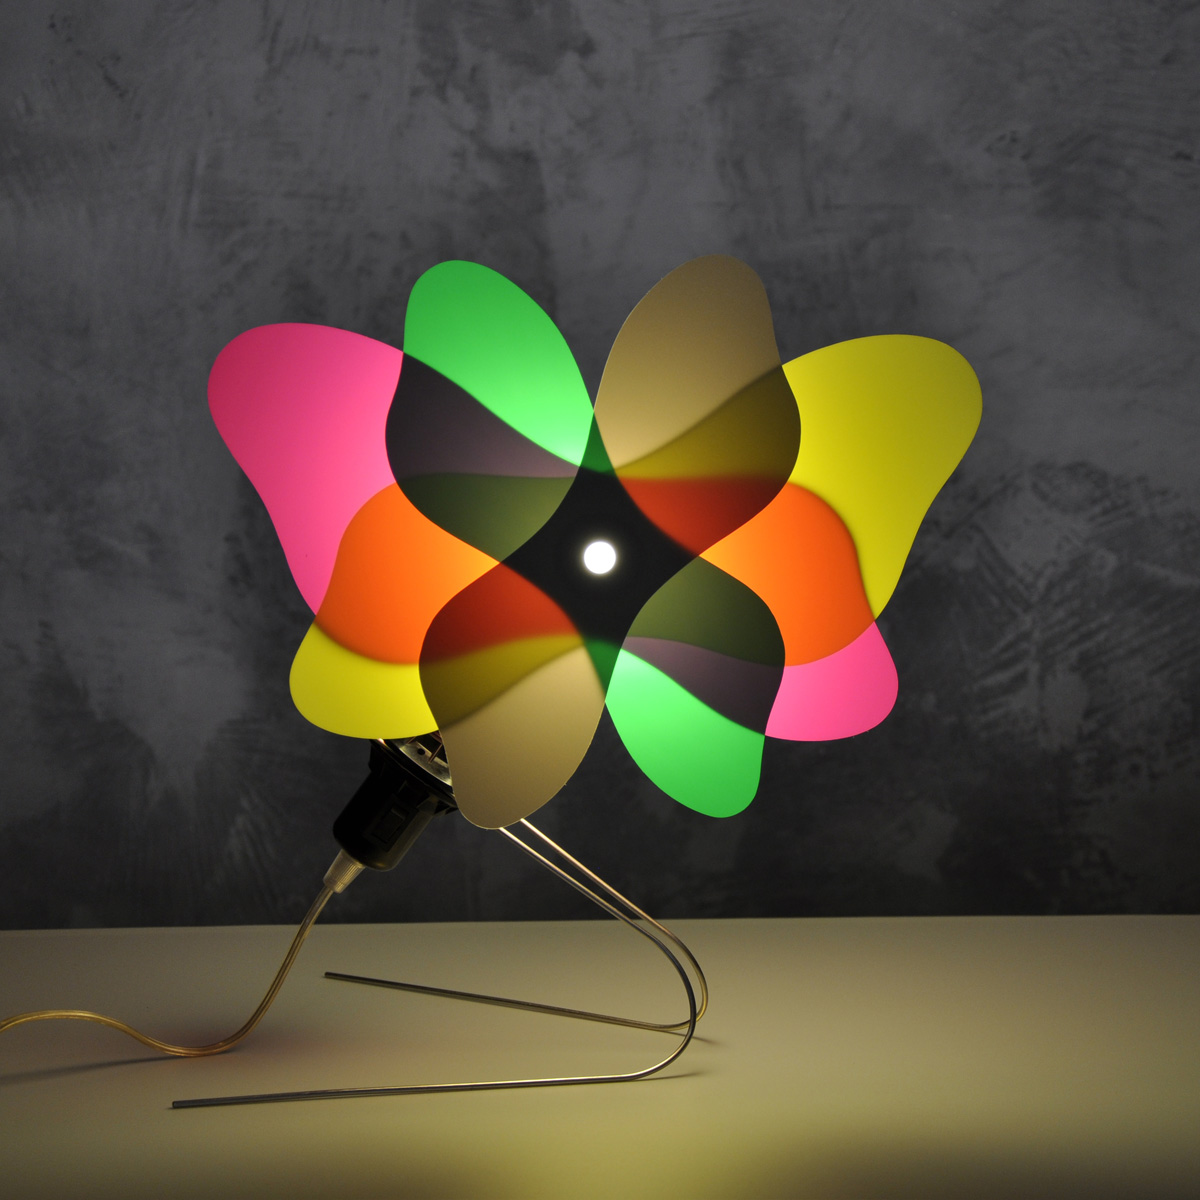 Freydenberg_Trans_Flower_Butterfly_13.jpg